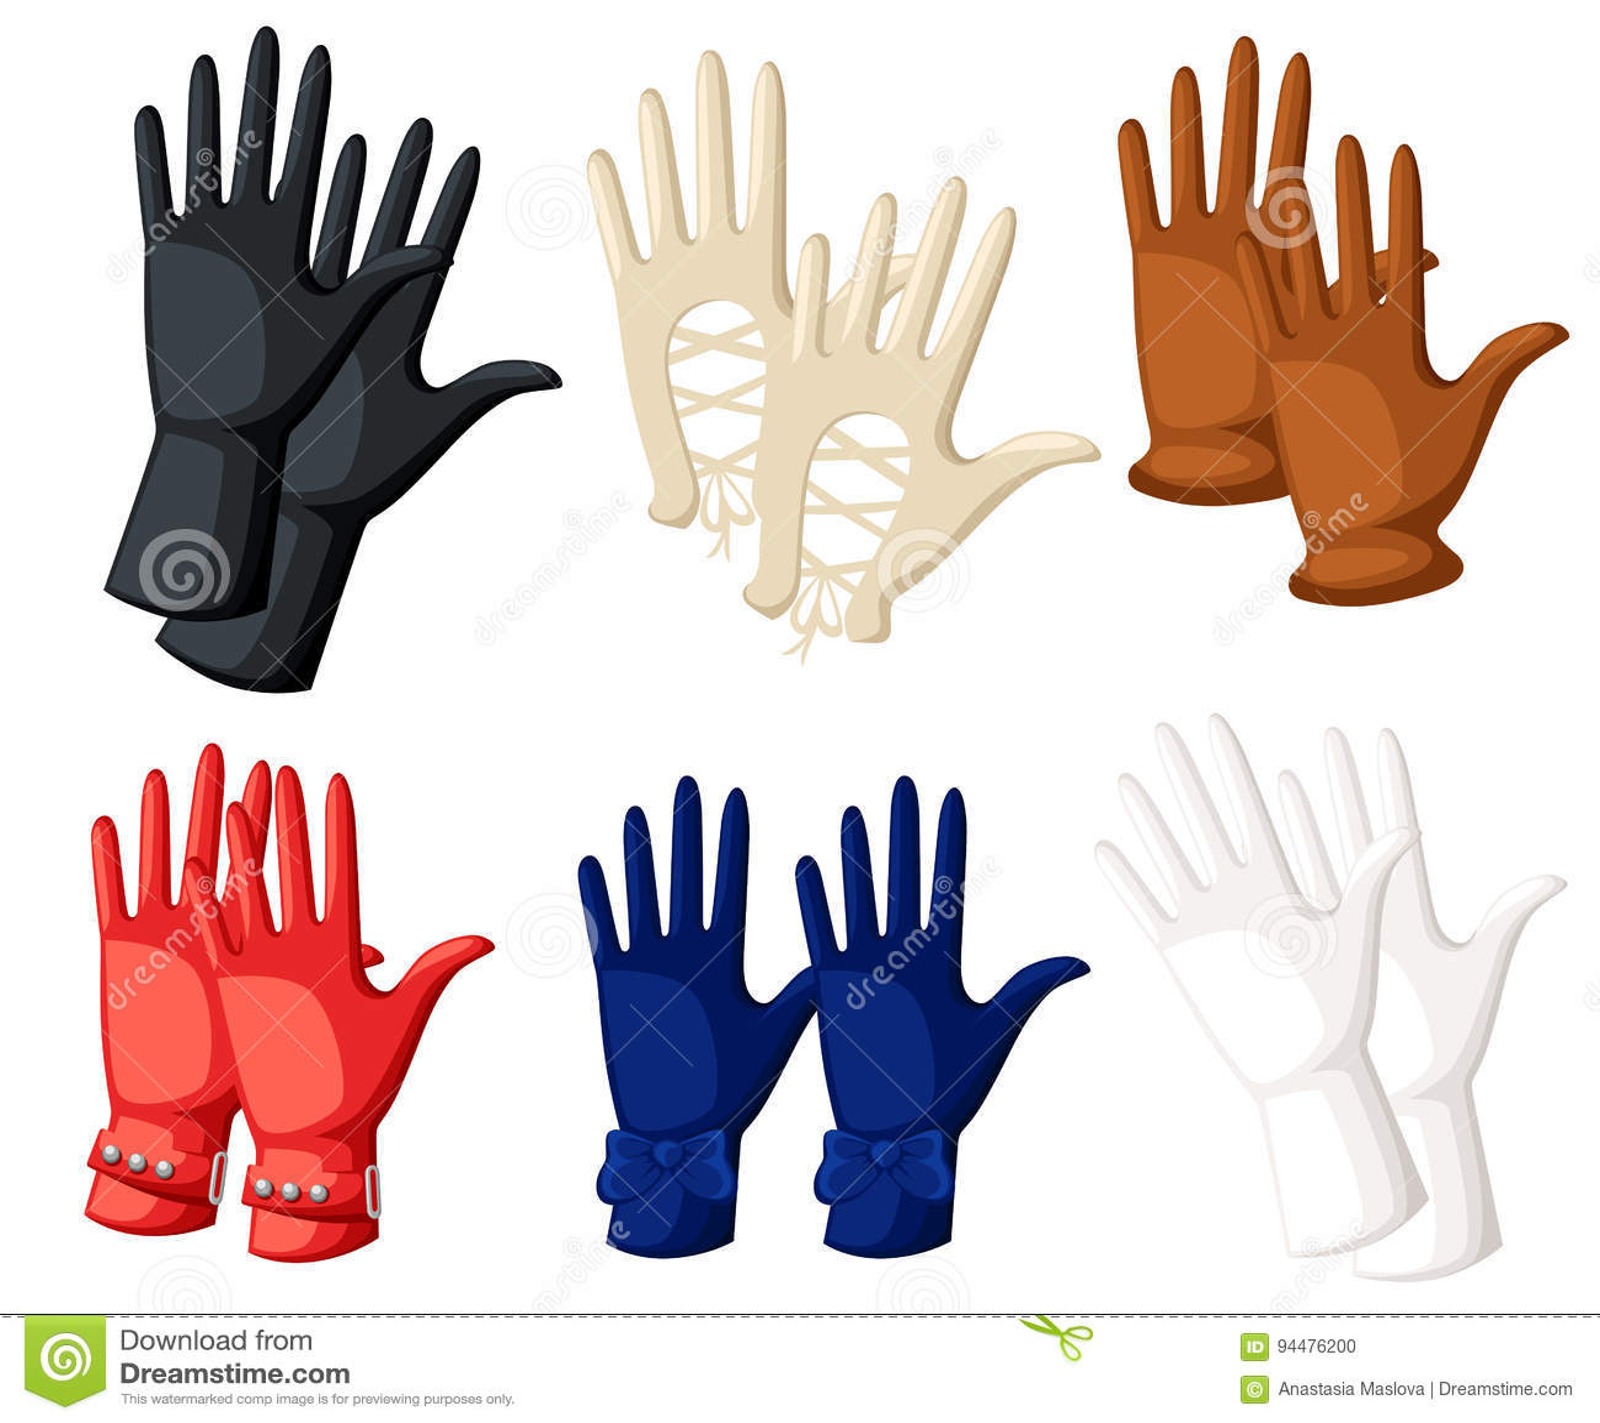 gants d hiver stock illustrations vecteurs clipart 5 298 stock illustrations. Black Bedroom Furniture Sets. Home Design Ideas